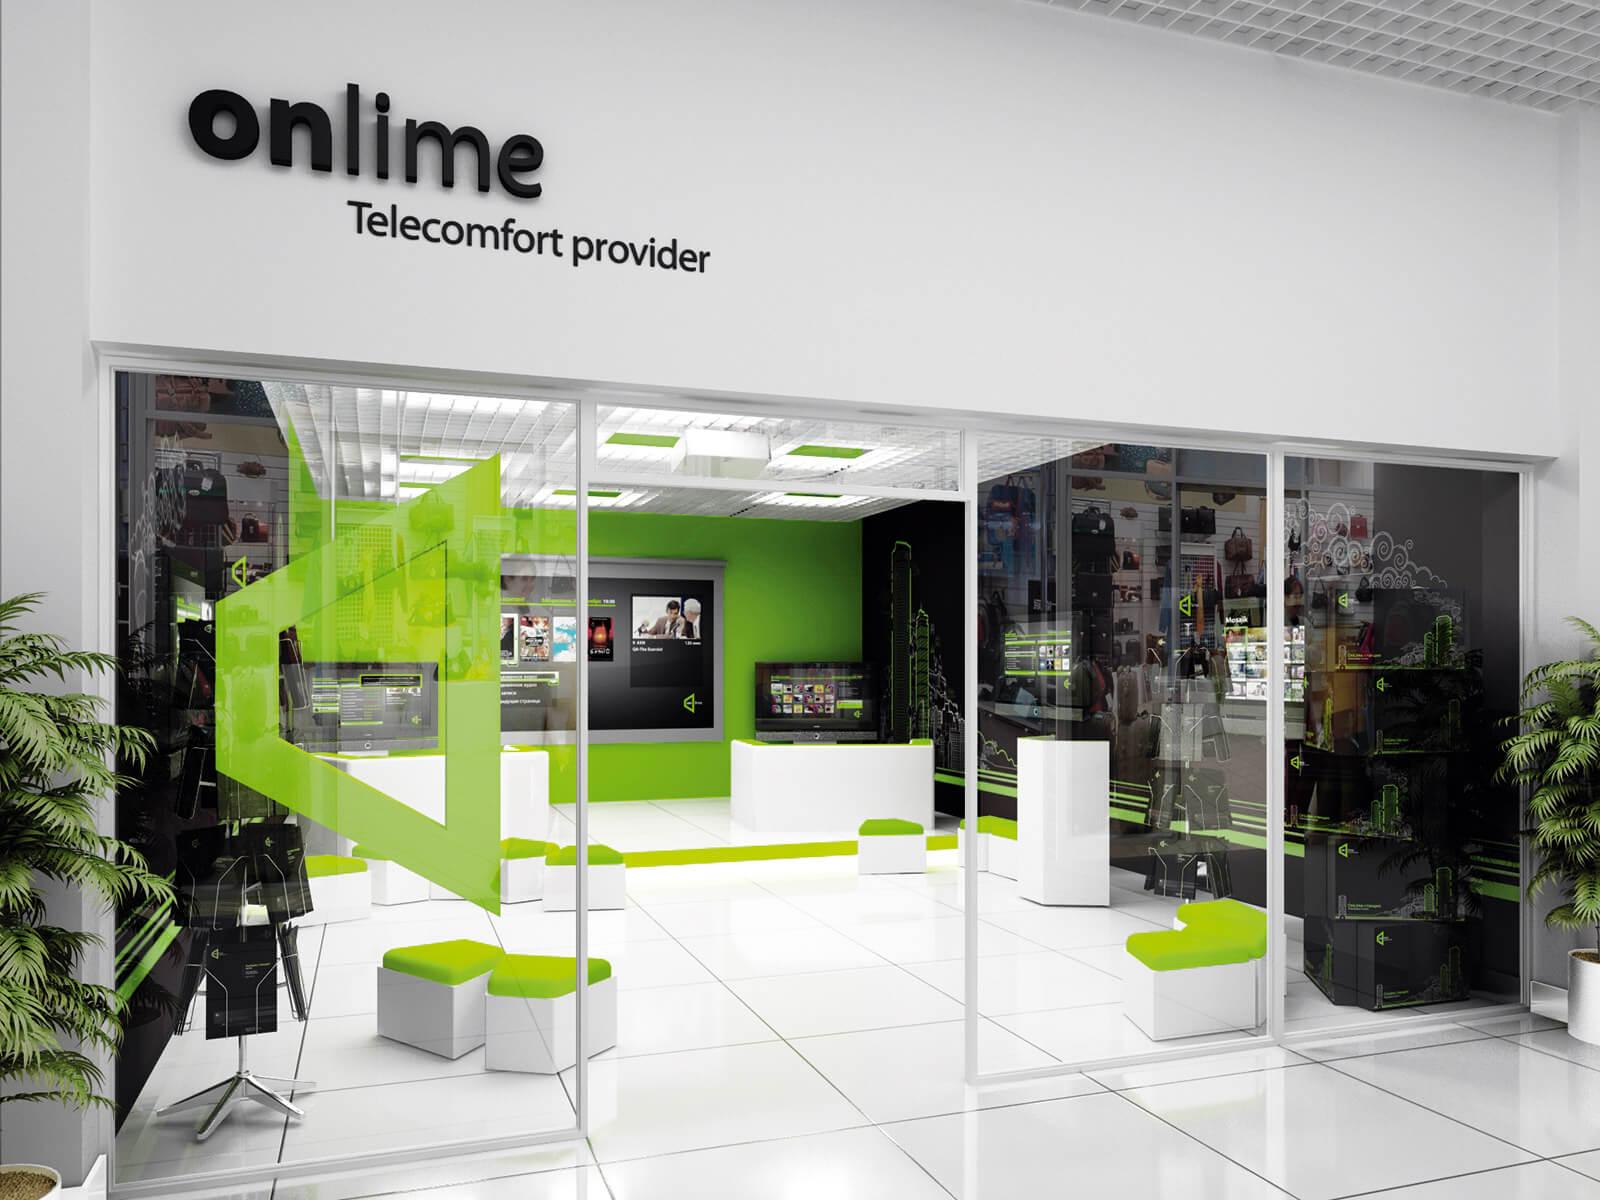 OnLime telecomfort provider